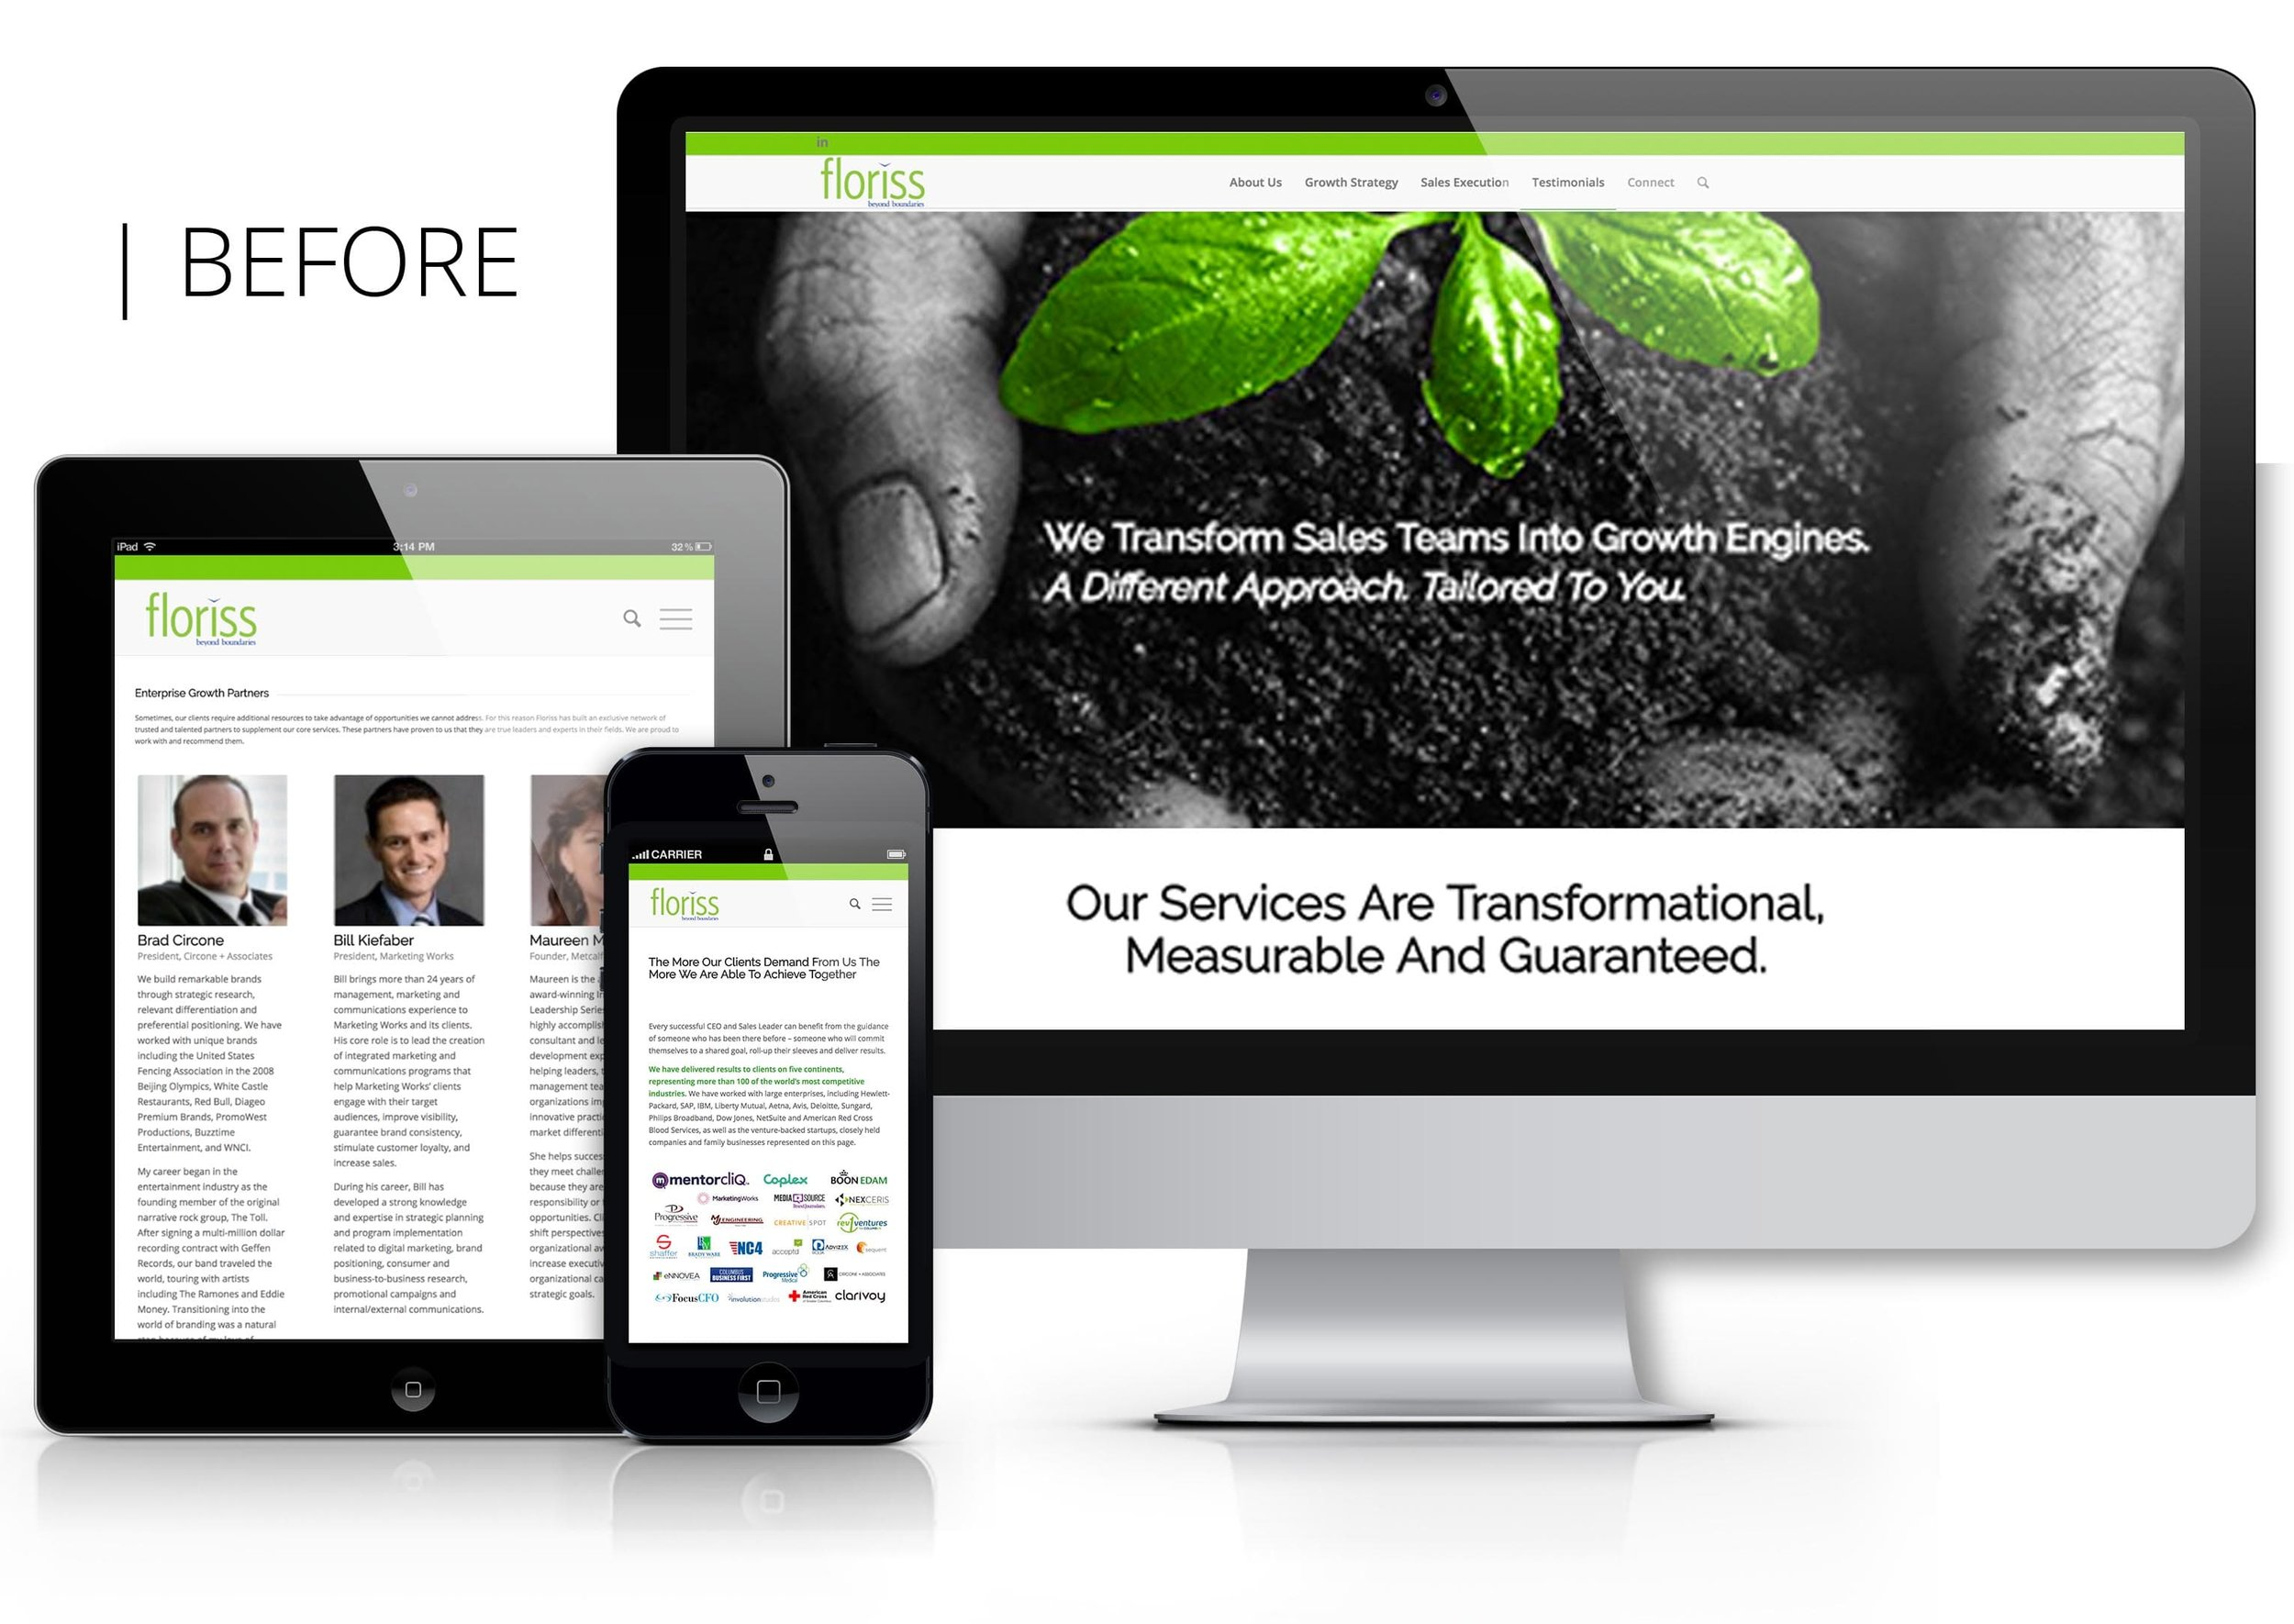 Floriss Group Website (Before)